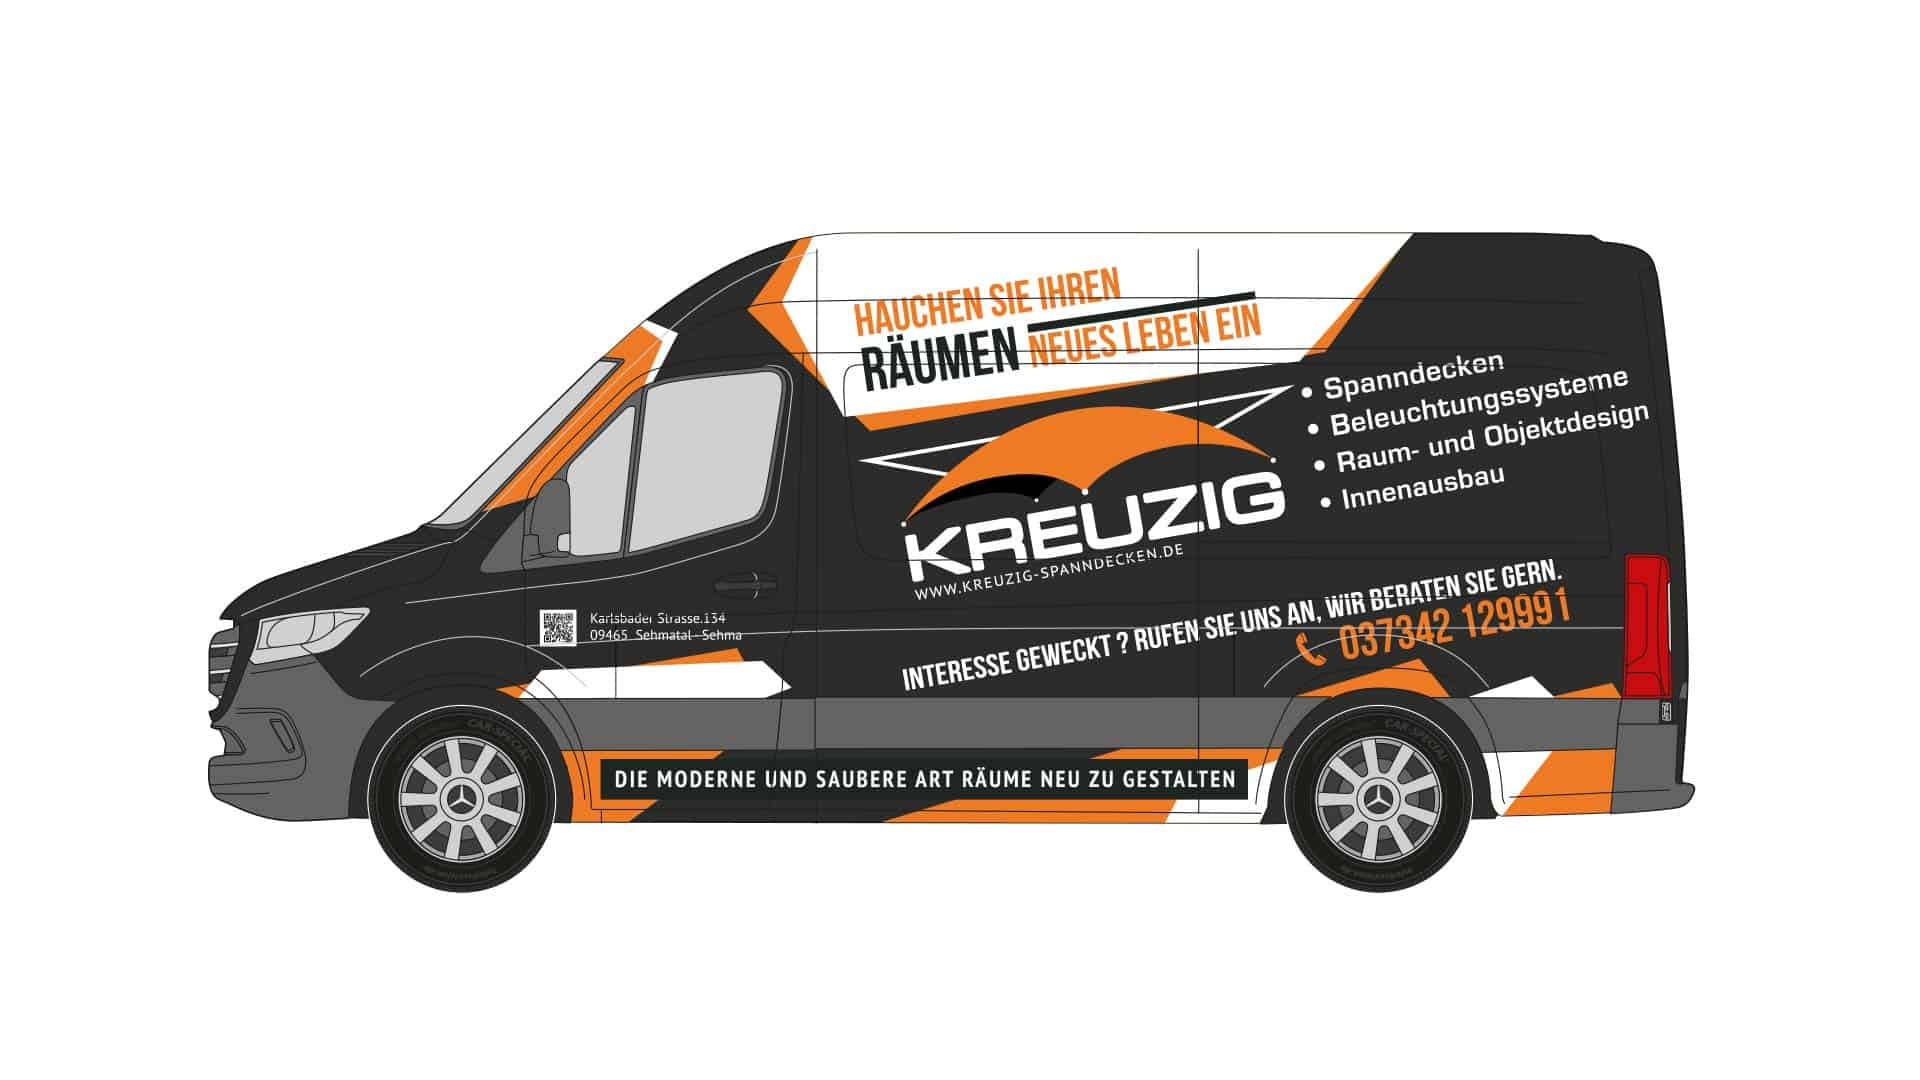 Kreuzig-Transporter_links